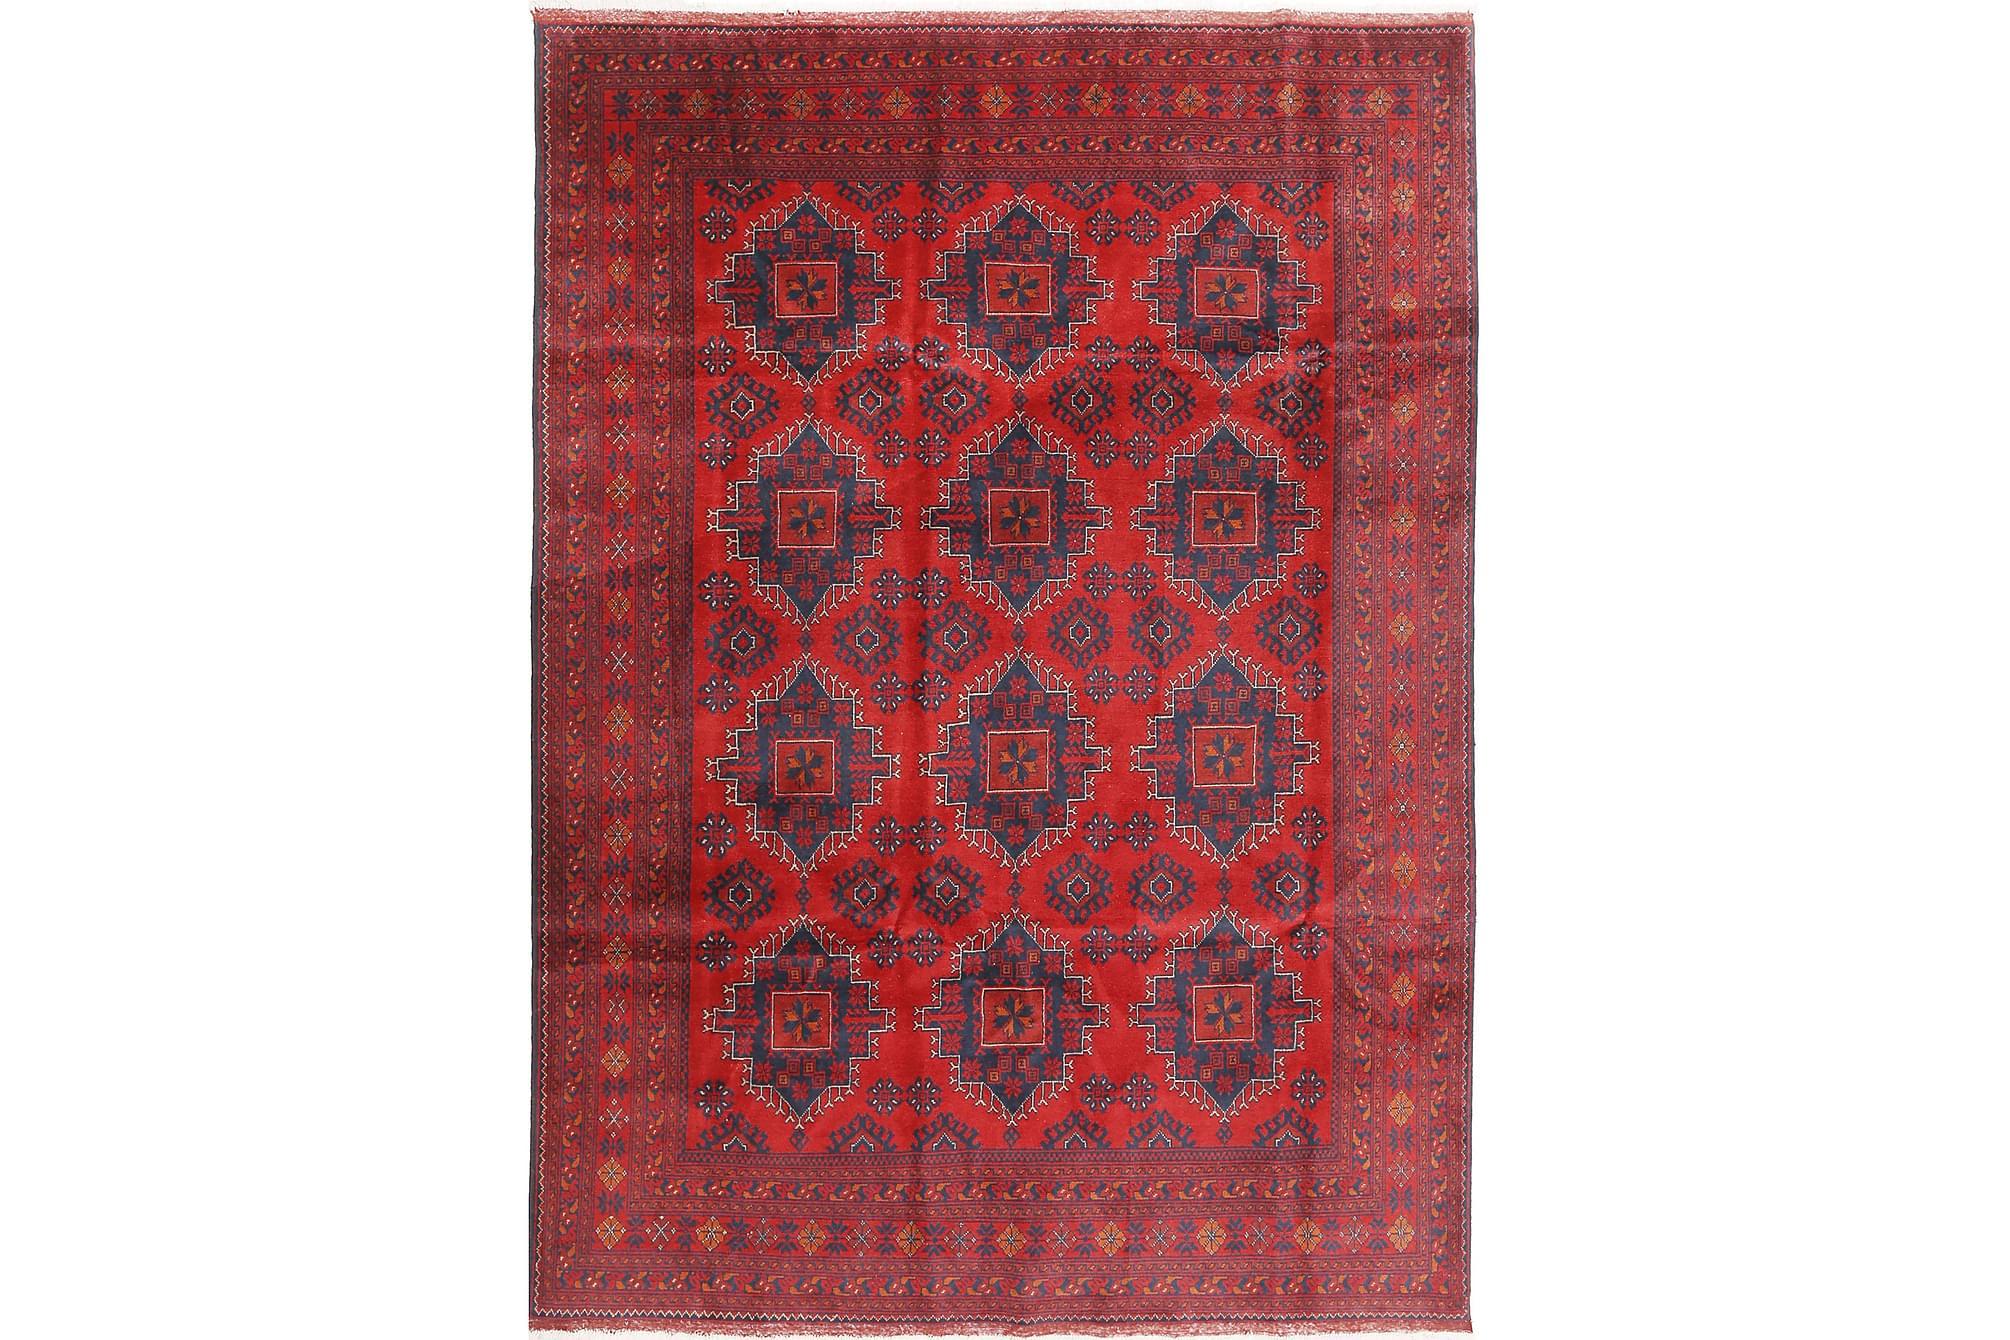 AFGHAN Matta 202x288 Stor Röd, Orientaliska mattor